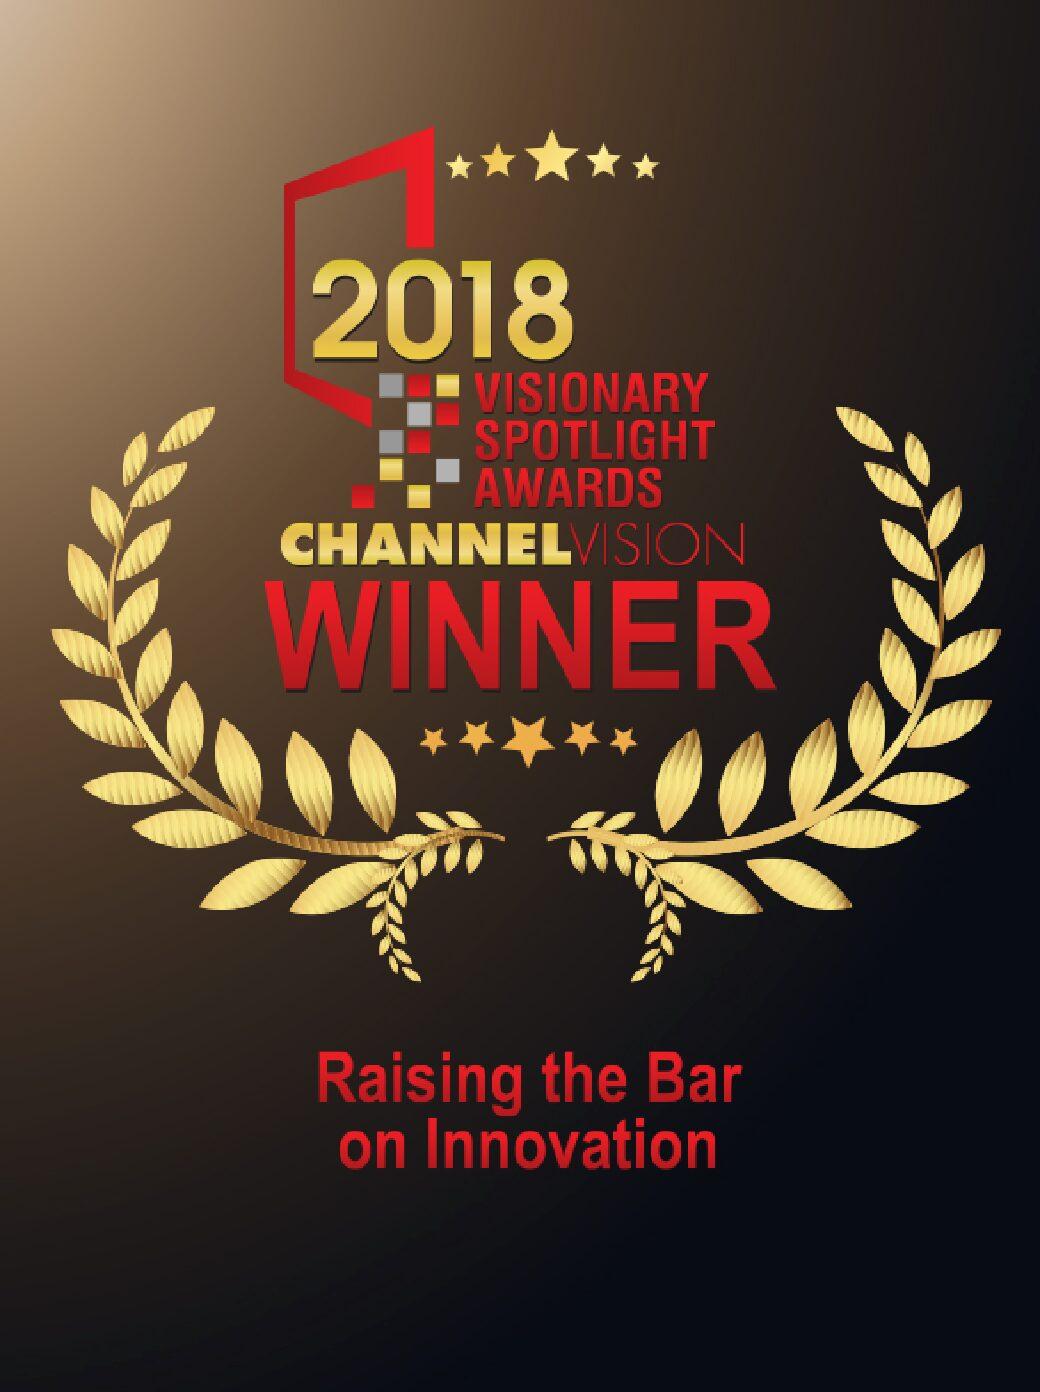 ChannelVision Visionary Spotlight Awards 2018